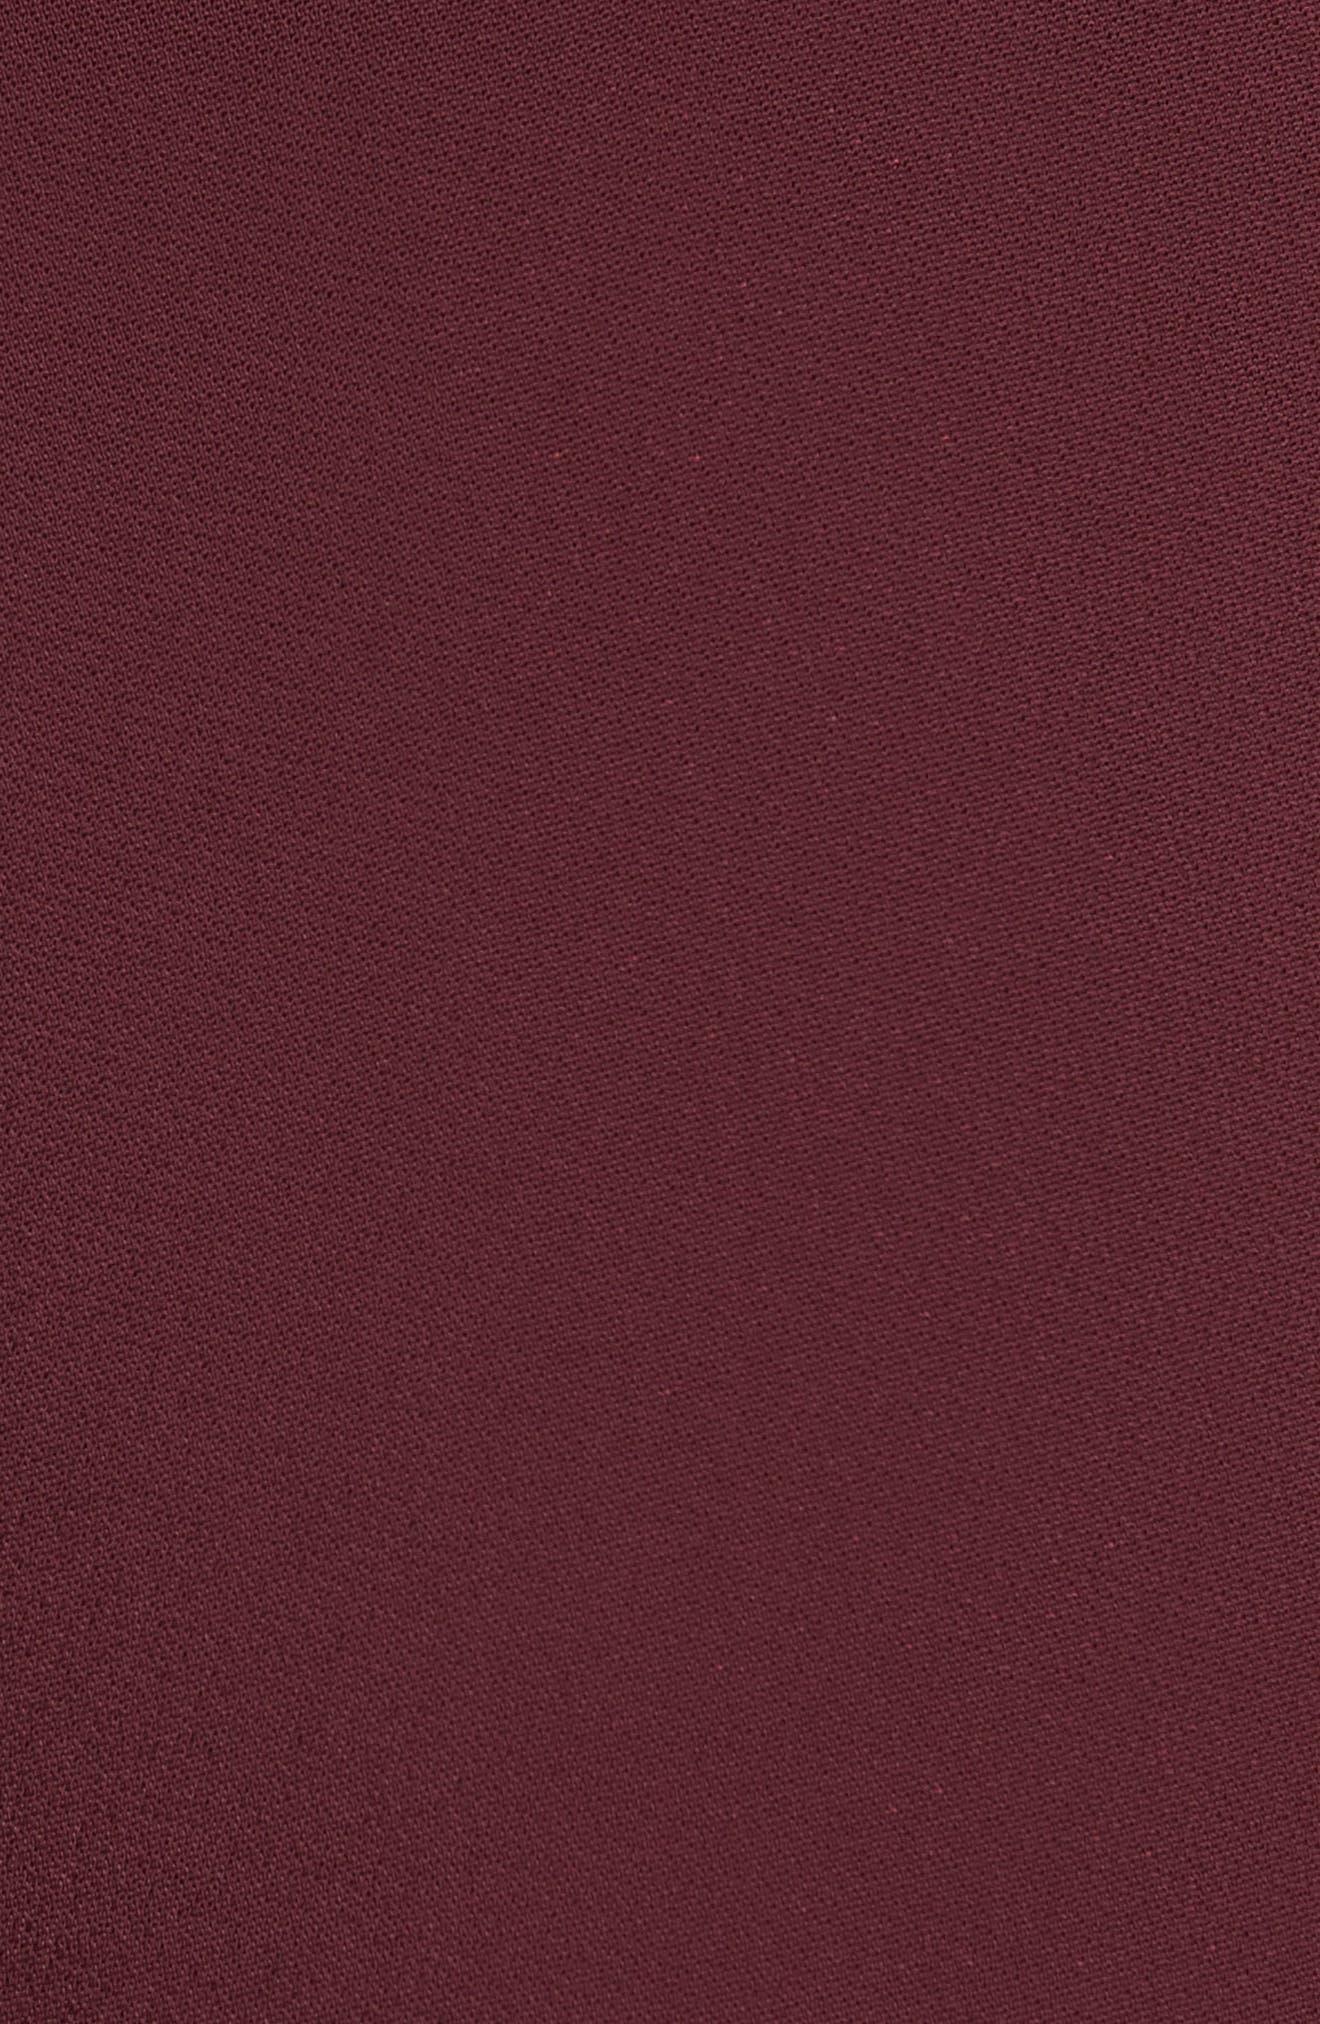 TIBI,                             Stella Stretch Suiting Crop Pants,                             Alternate thumbnail 6, color,                             DARK CURRANT